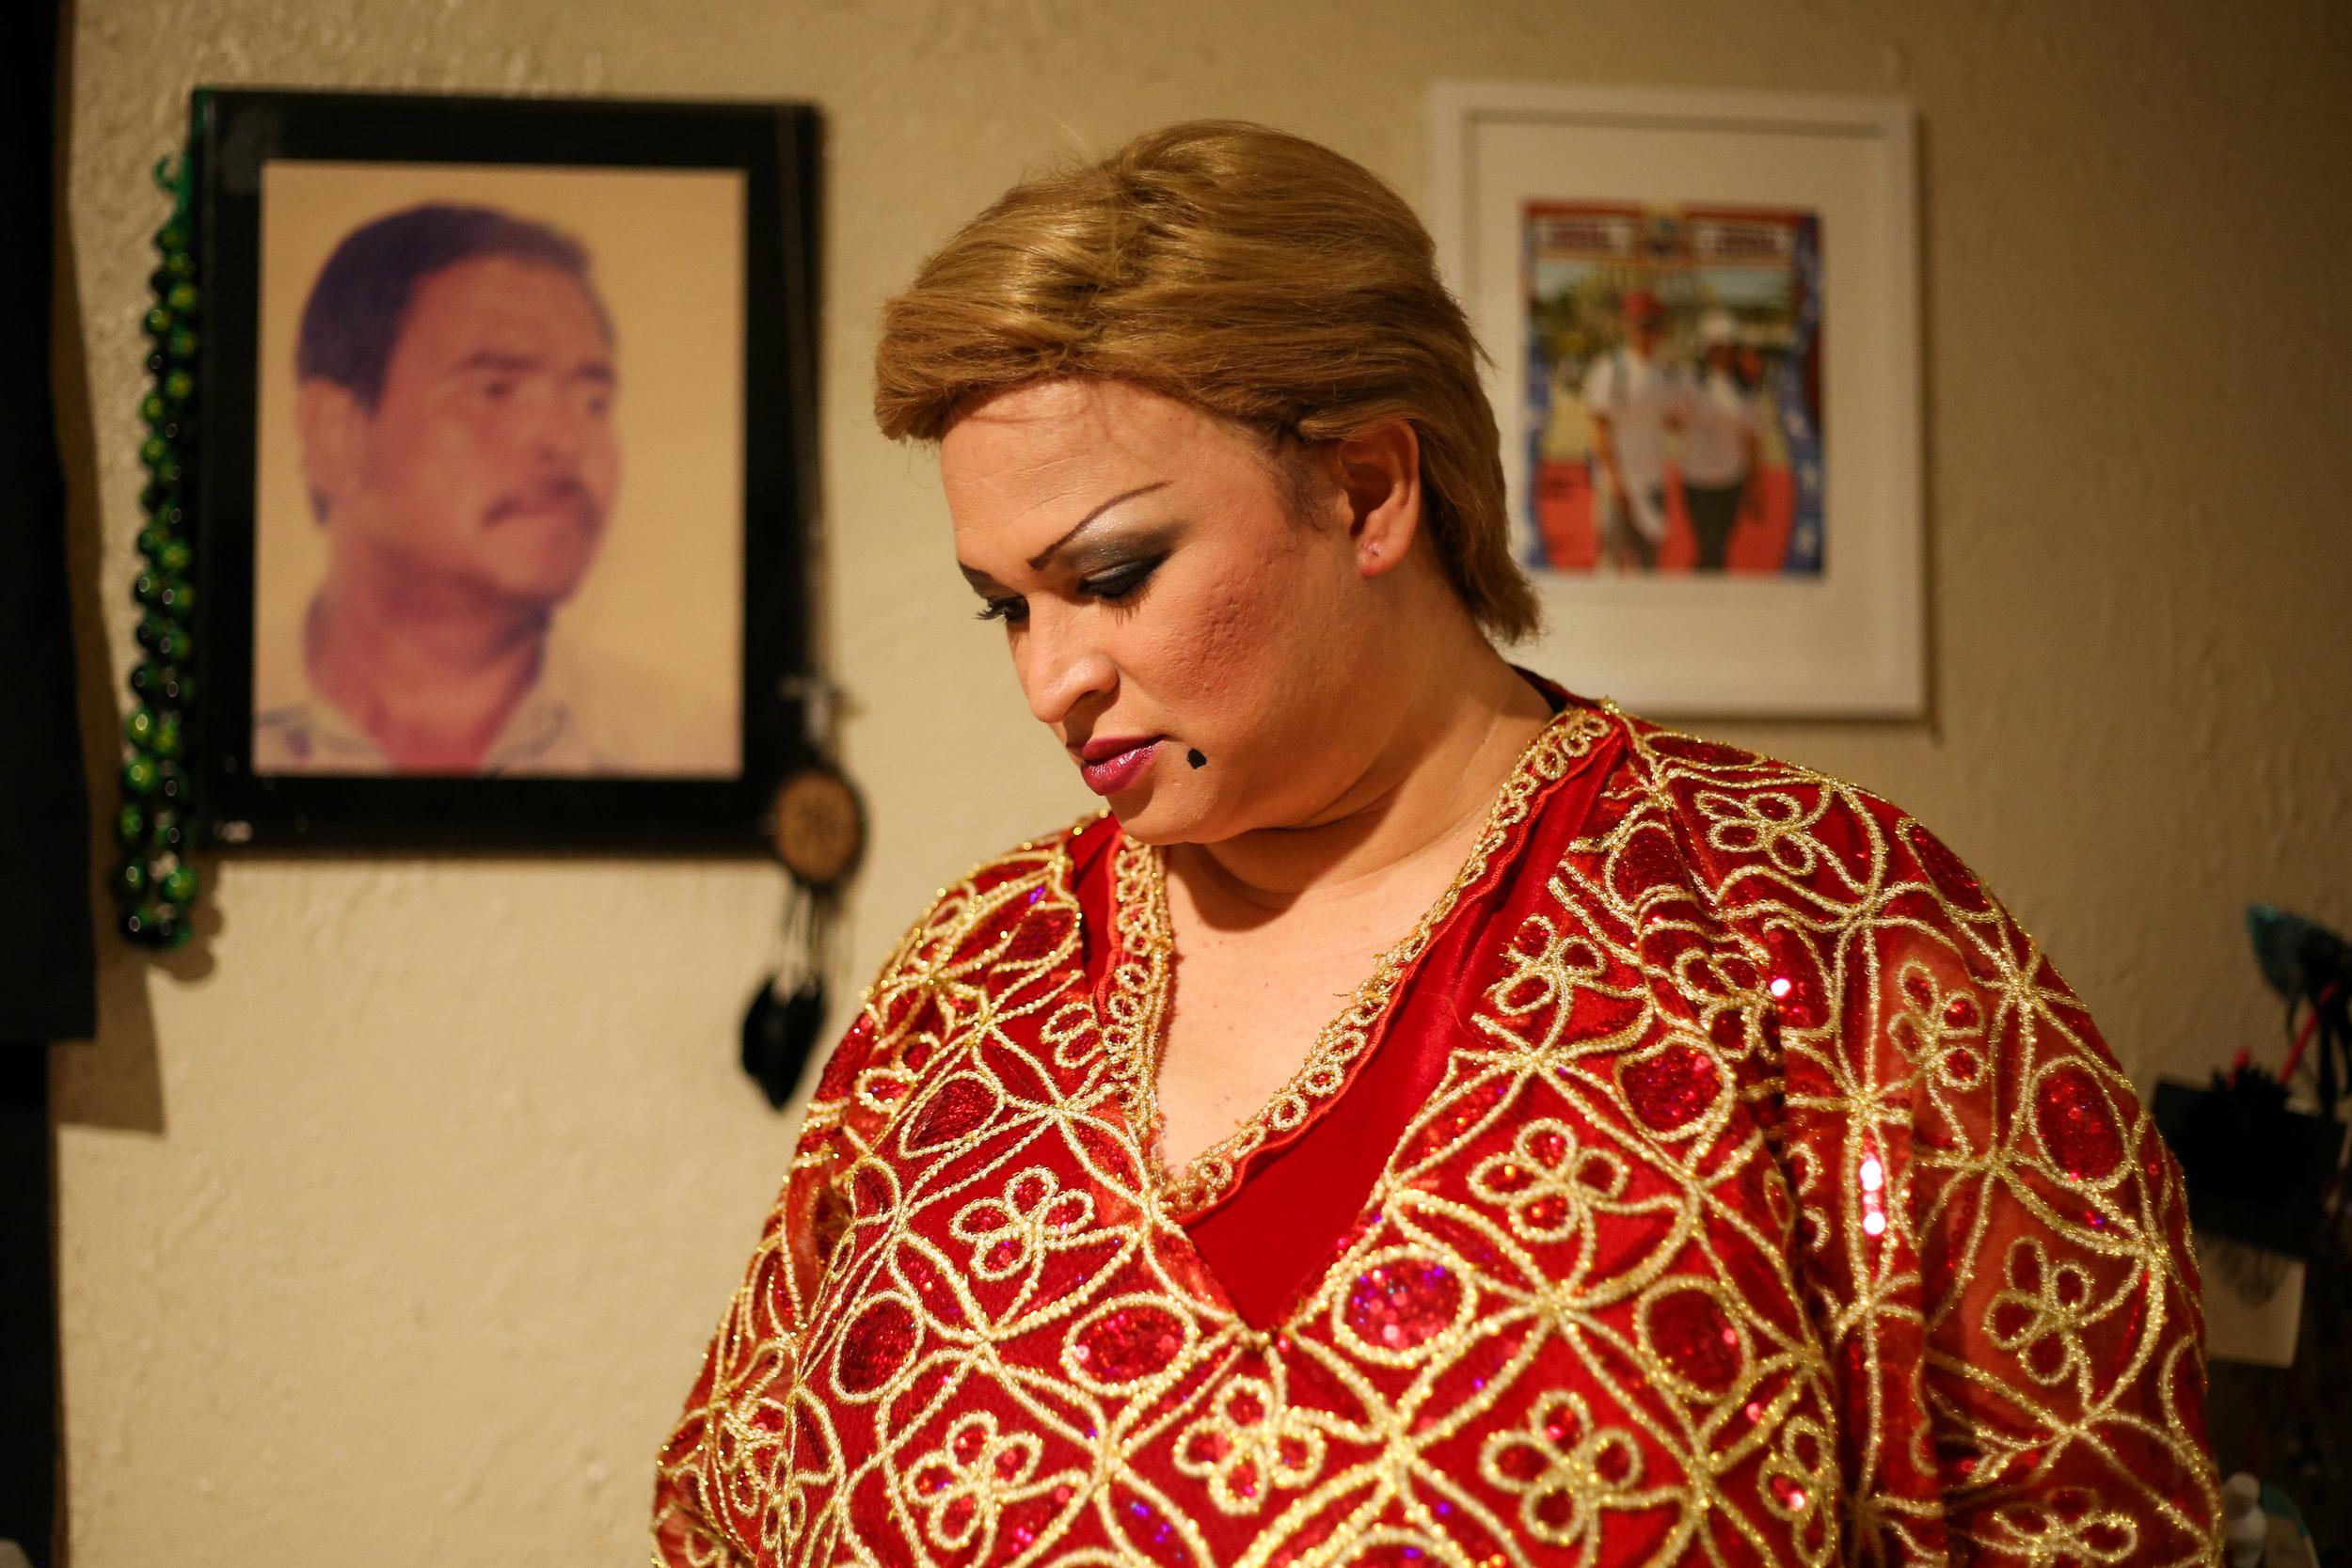 Barbara dressed as Paquita la del barrio, Inglewood, California 2017